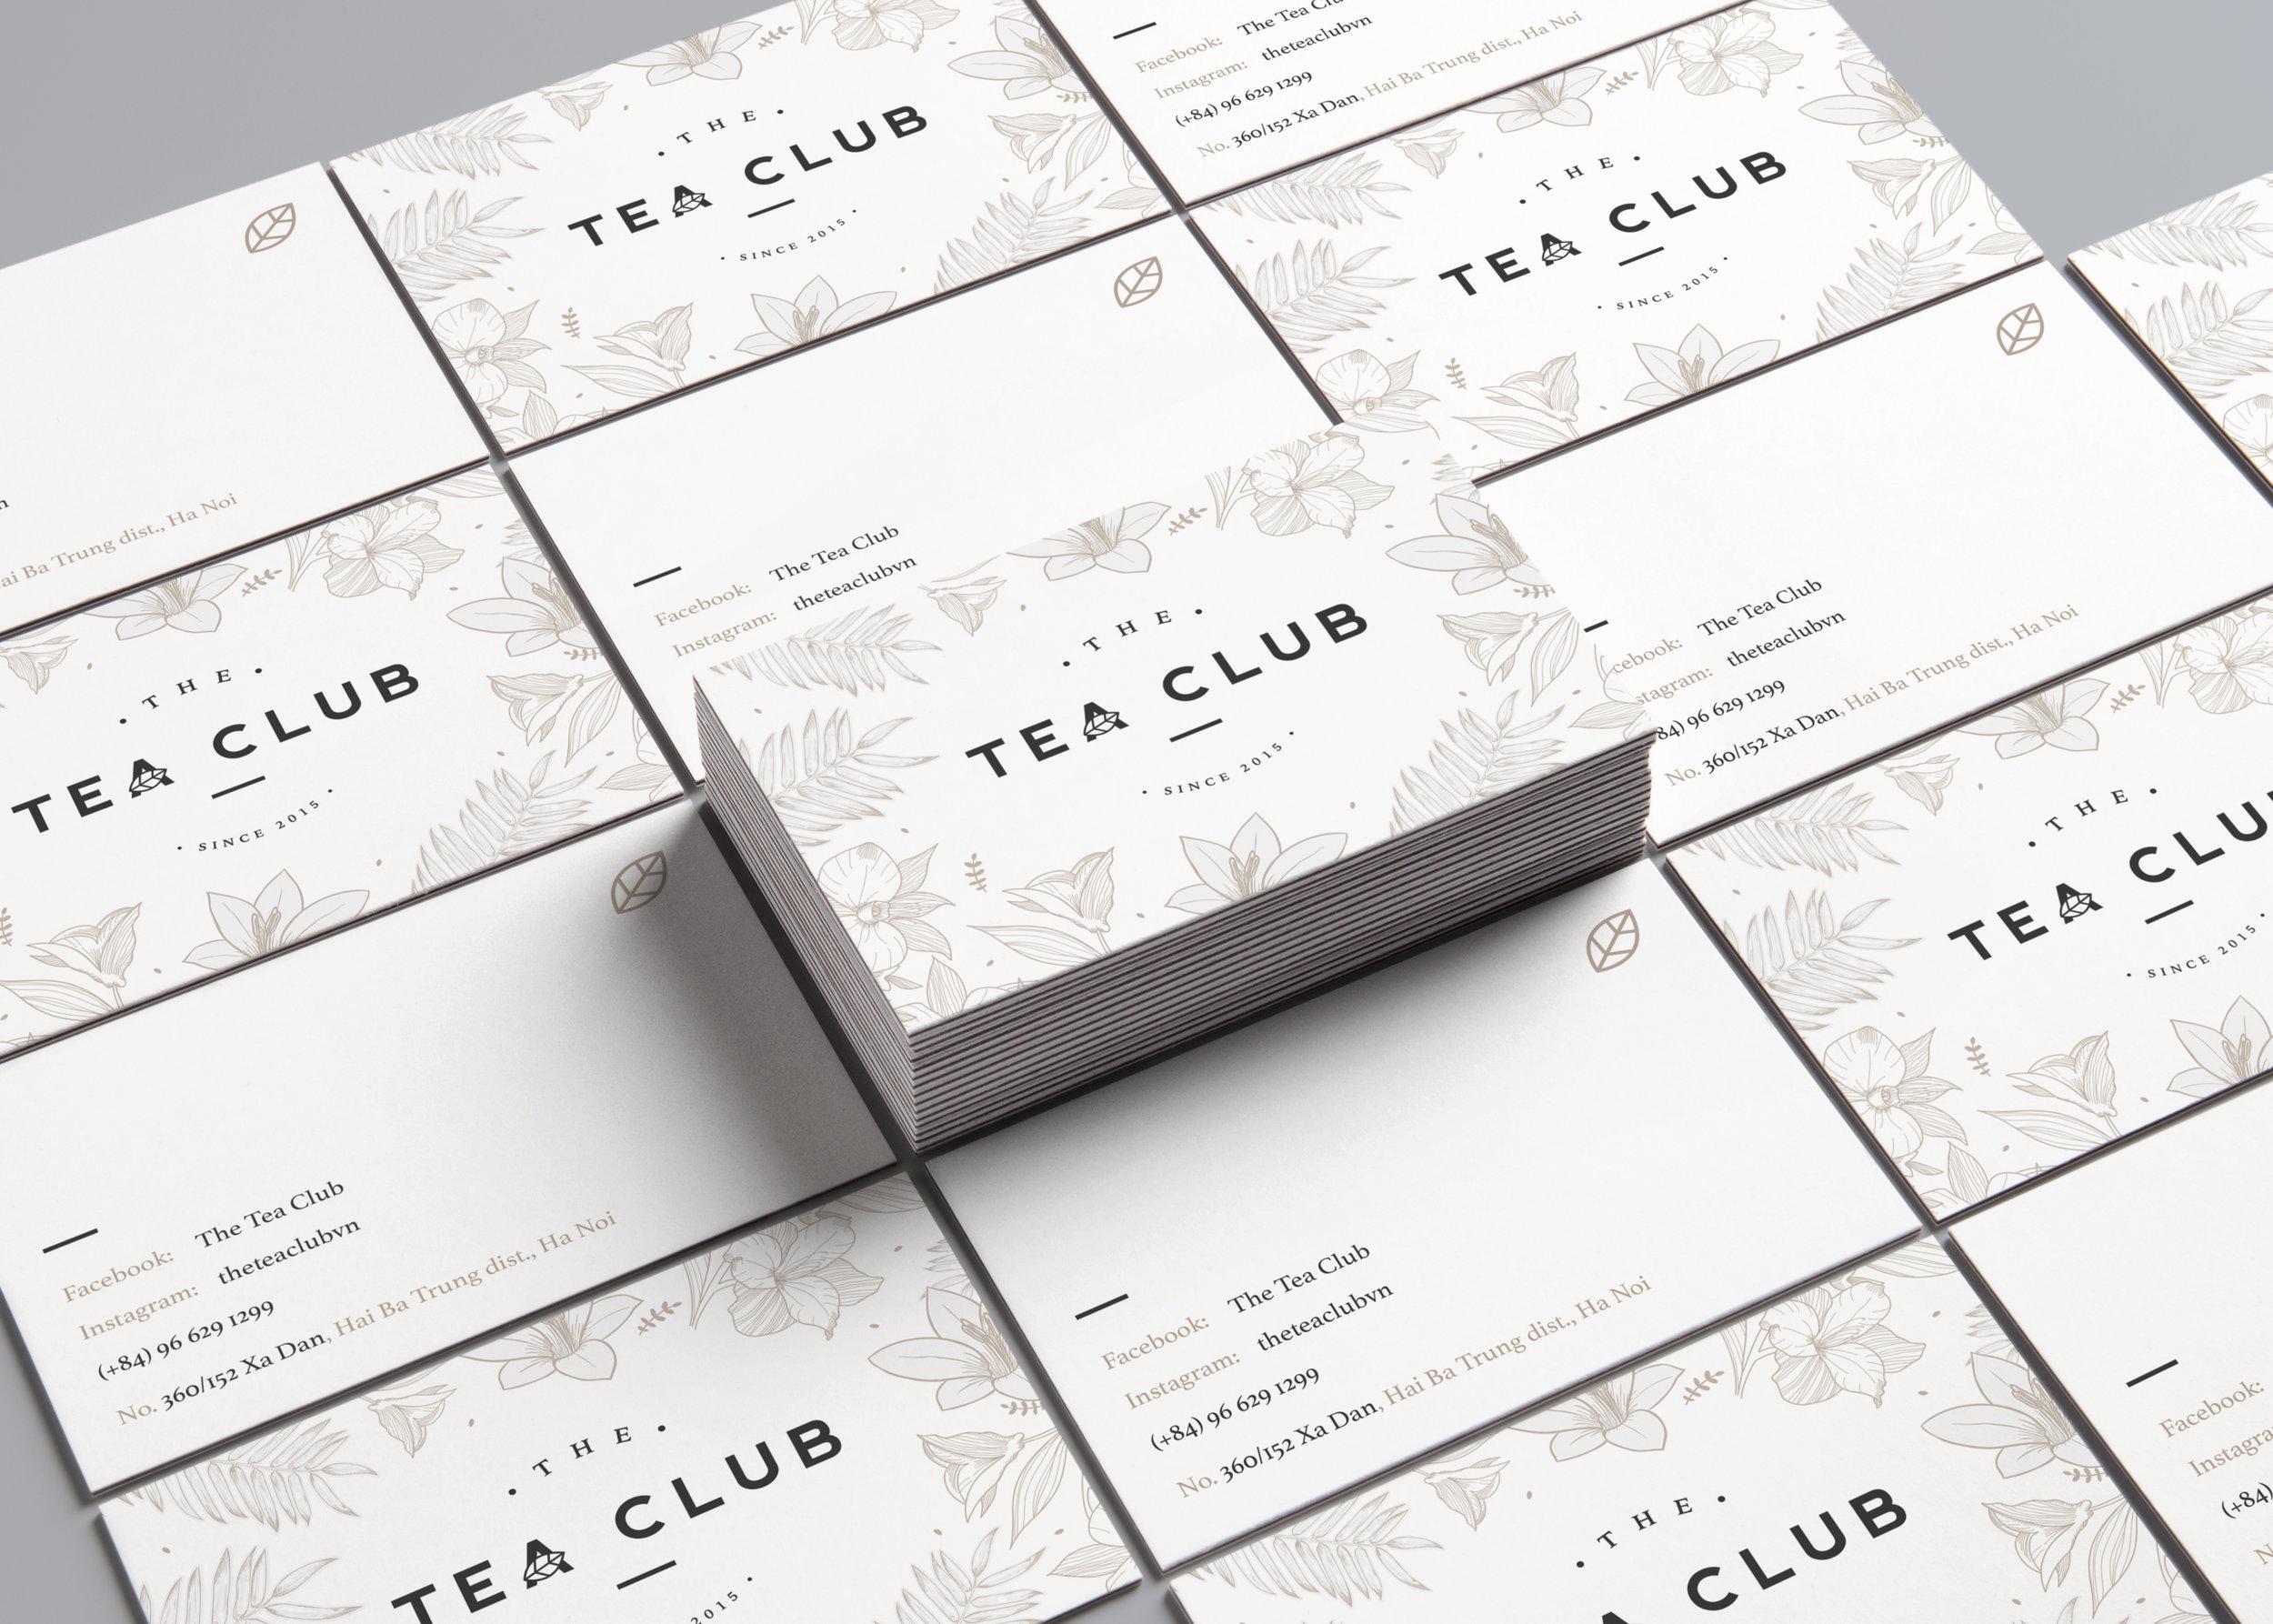 teaclub-card-white-sample.jpg